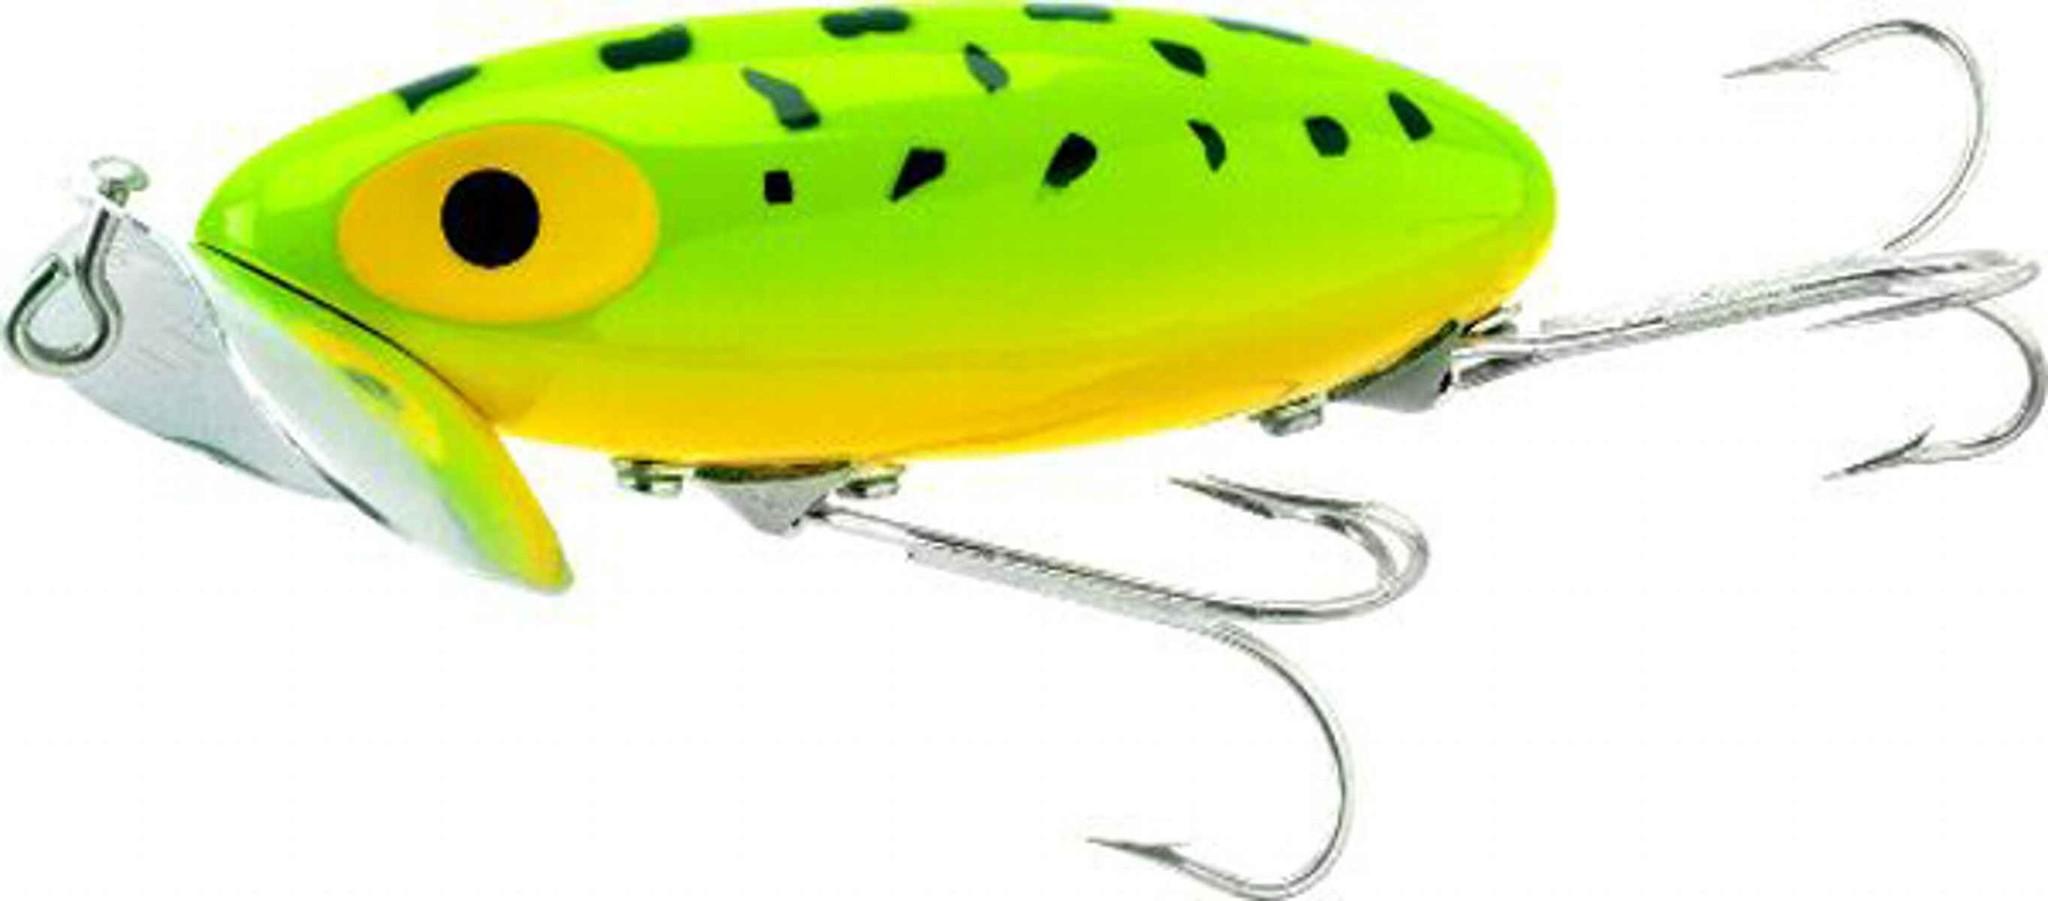 Arbogast Arbogast Topwater Jitterbug Lure 3/8oz.